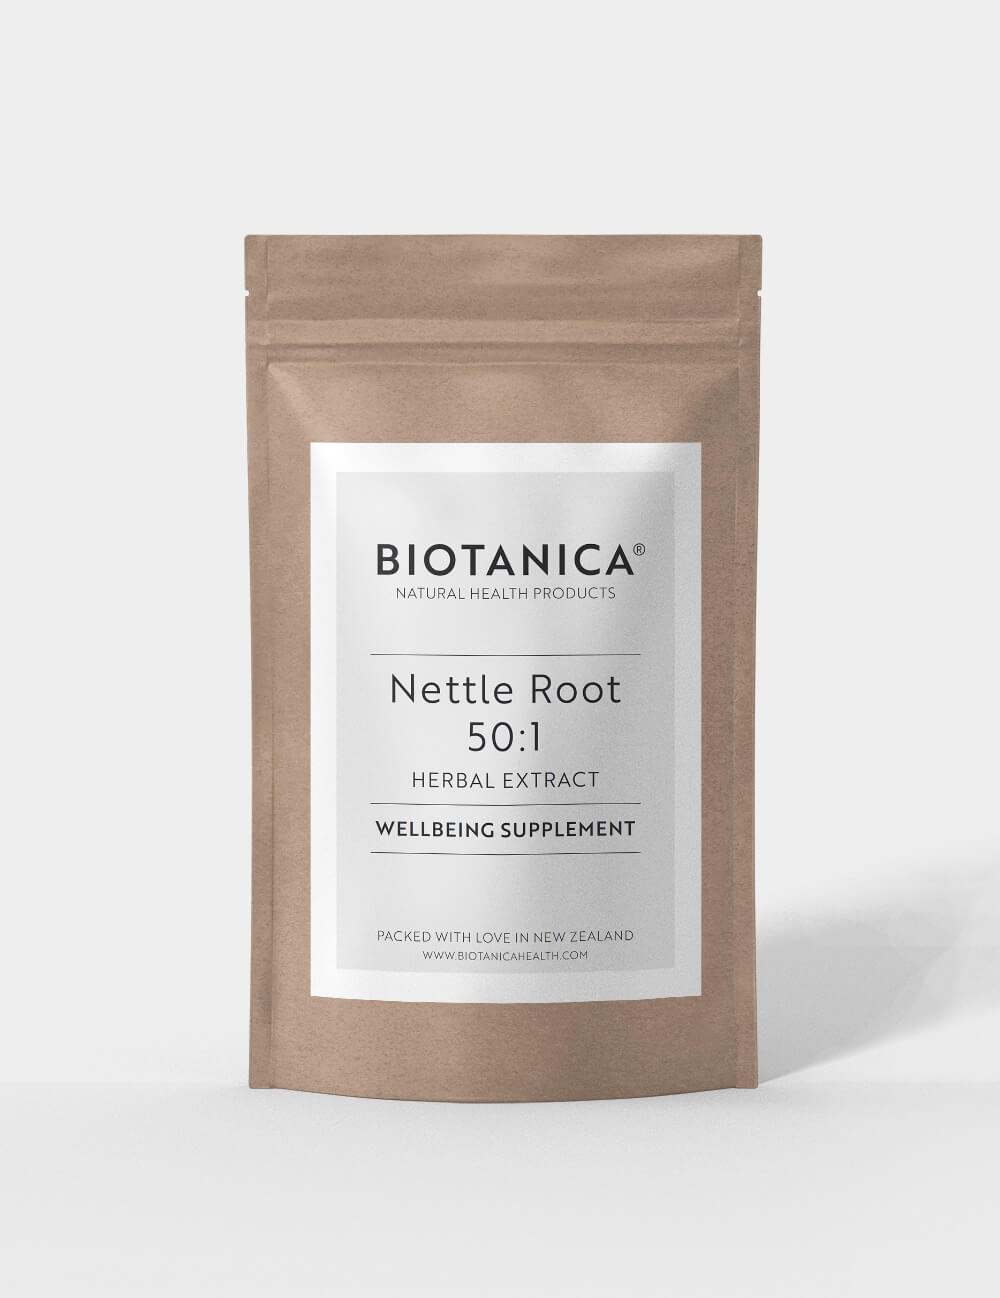 Nettle Root Image 1